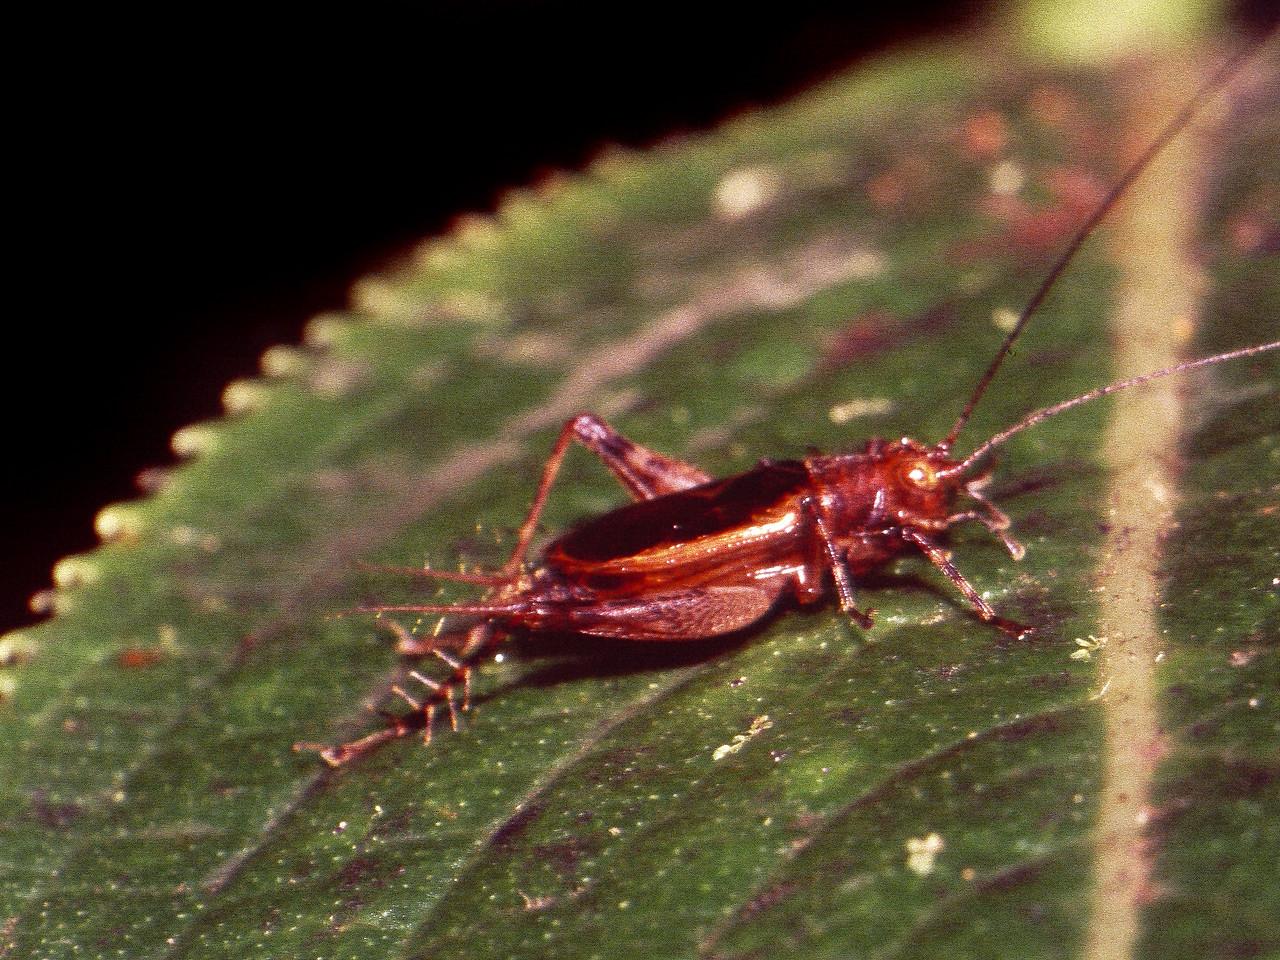 Laupala sp. (Gryllidae), West Maui